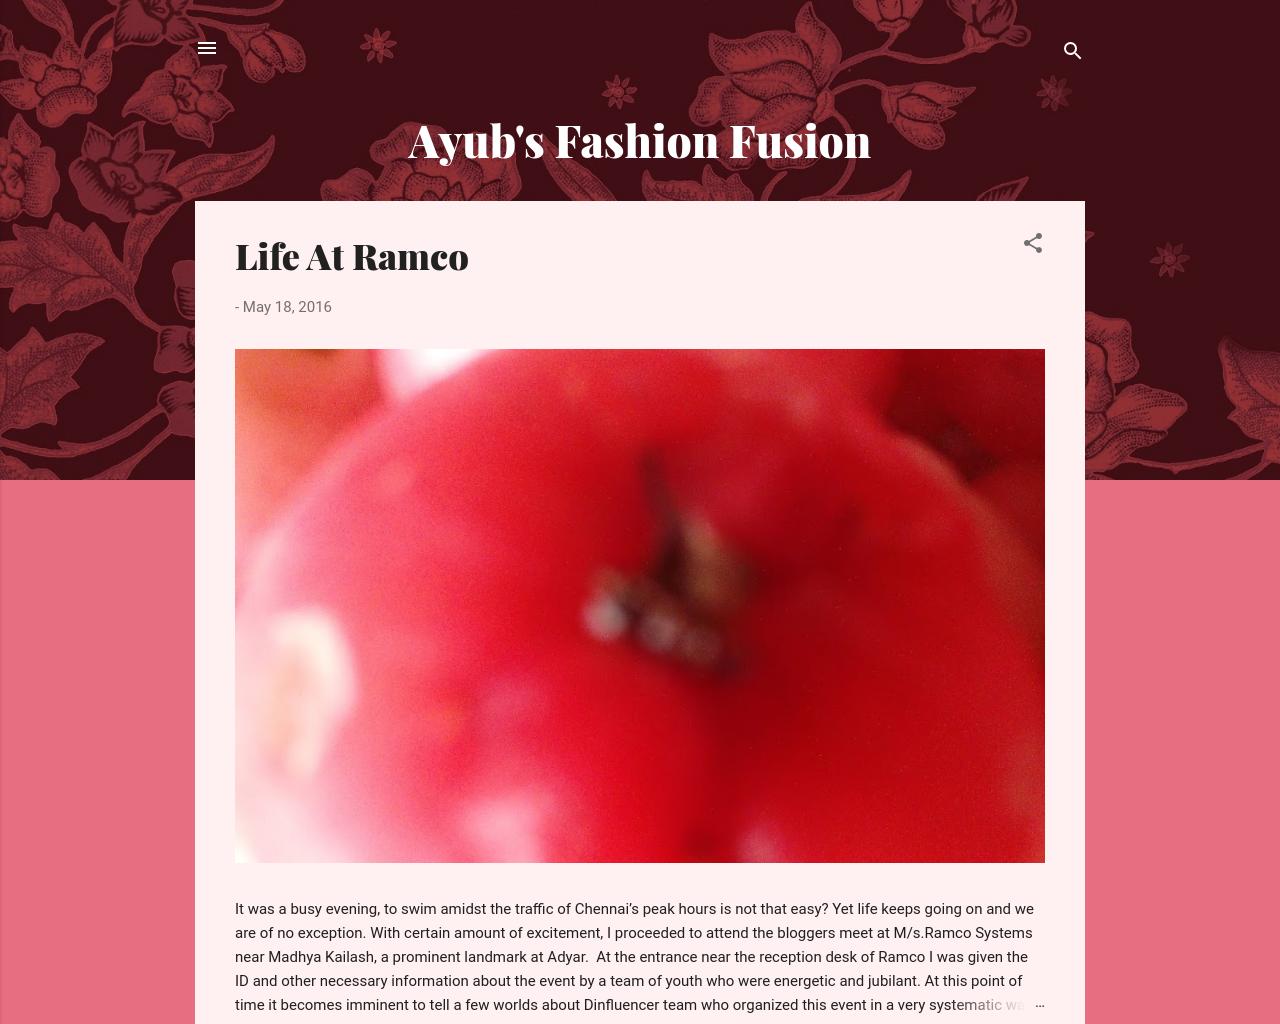 Ayub's Fashion Fusion